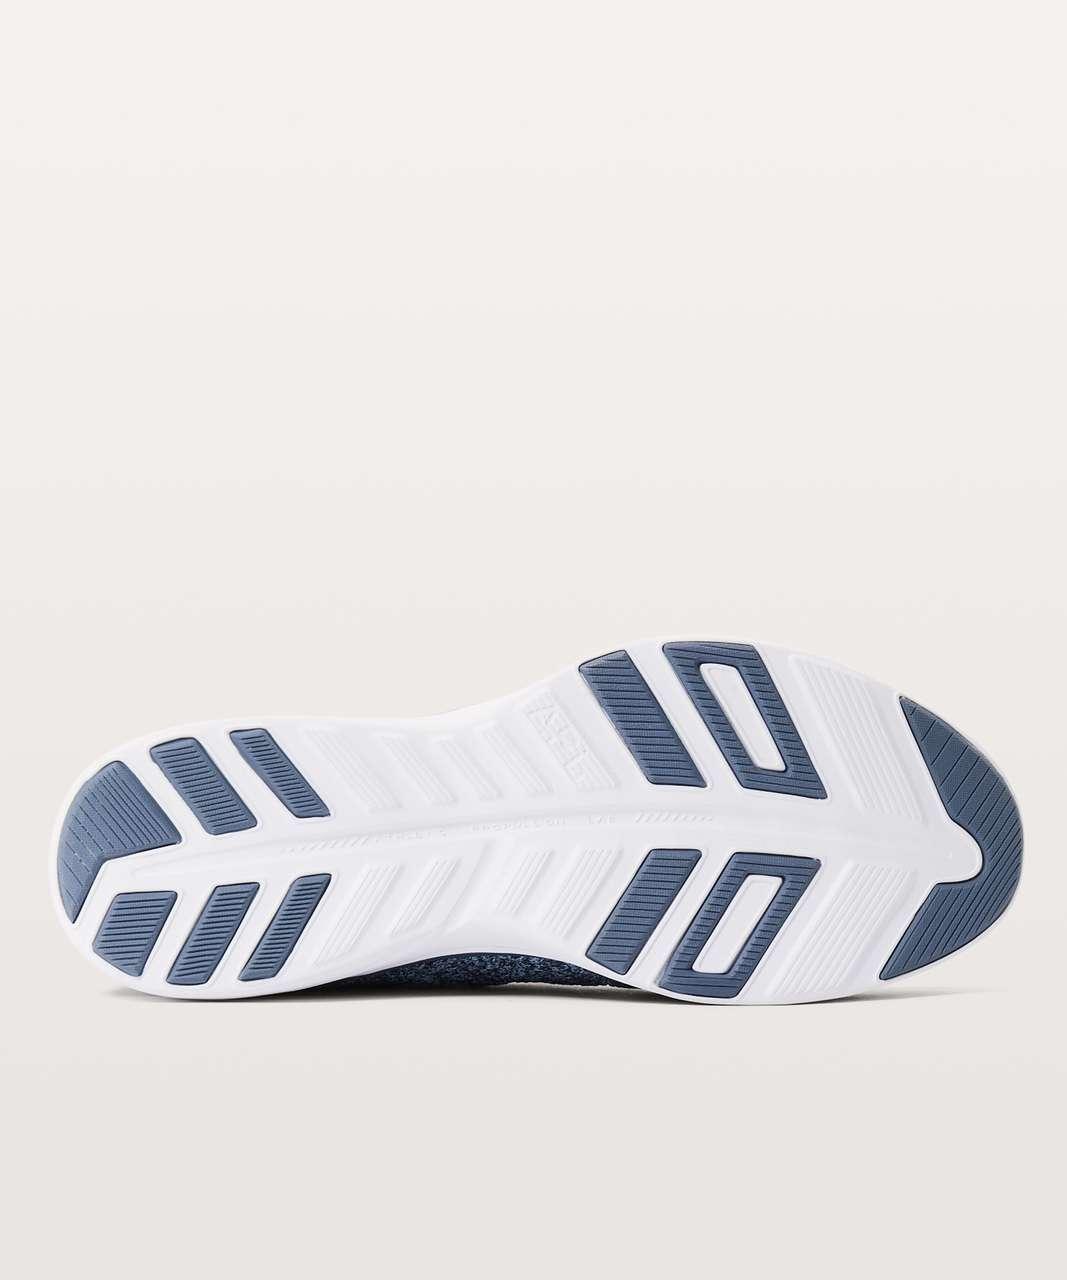 Discount 183443 Adidas Skate Tribe Men Orange Shoes